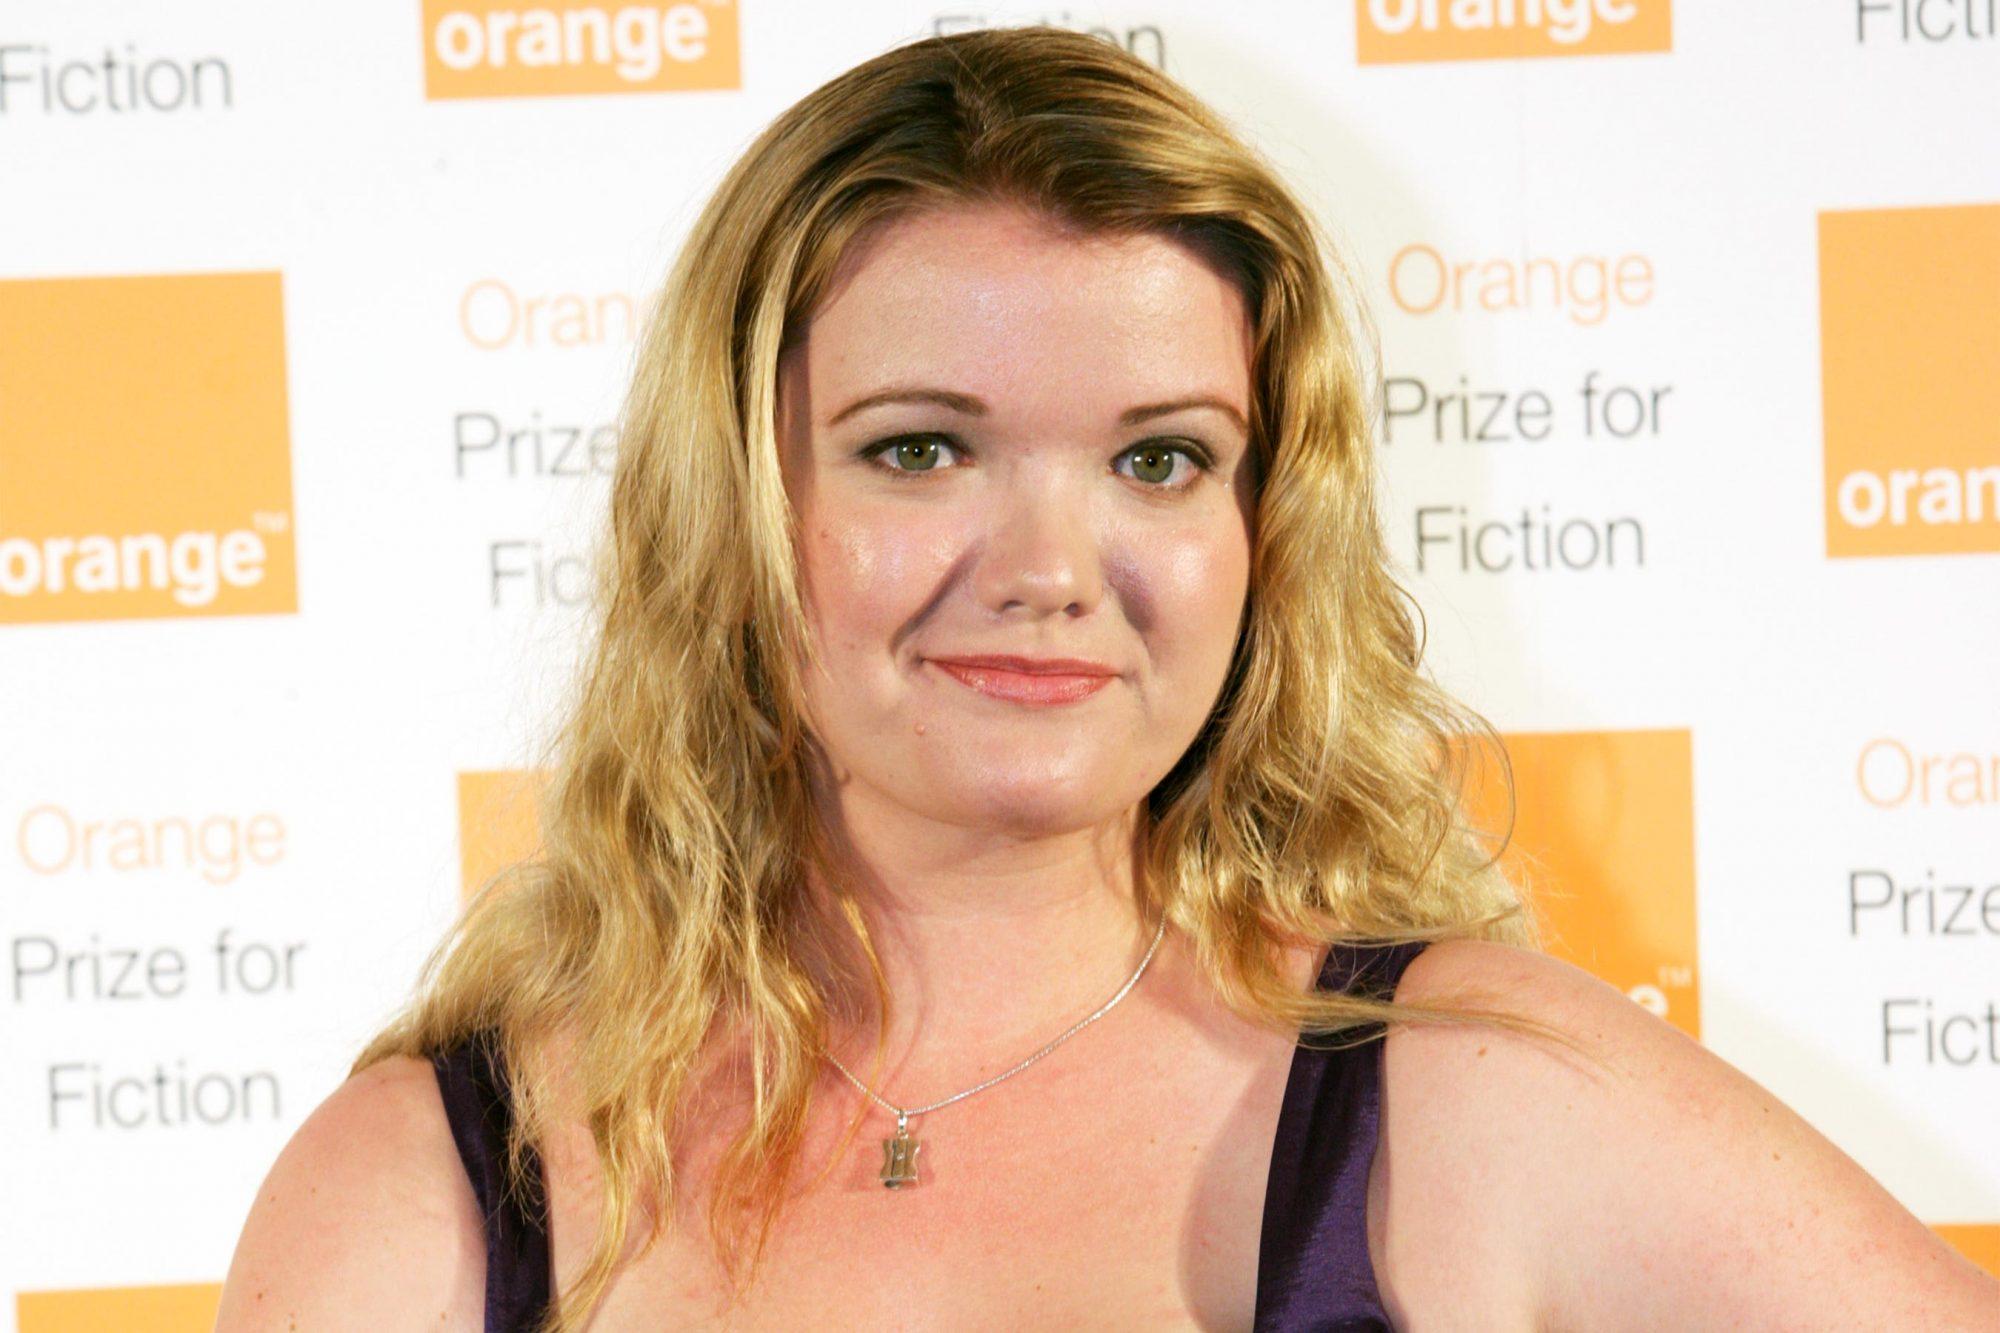 Orange Prize For Fiction 2011